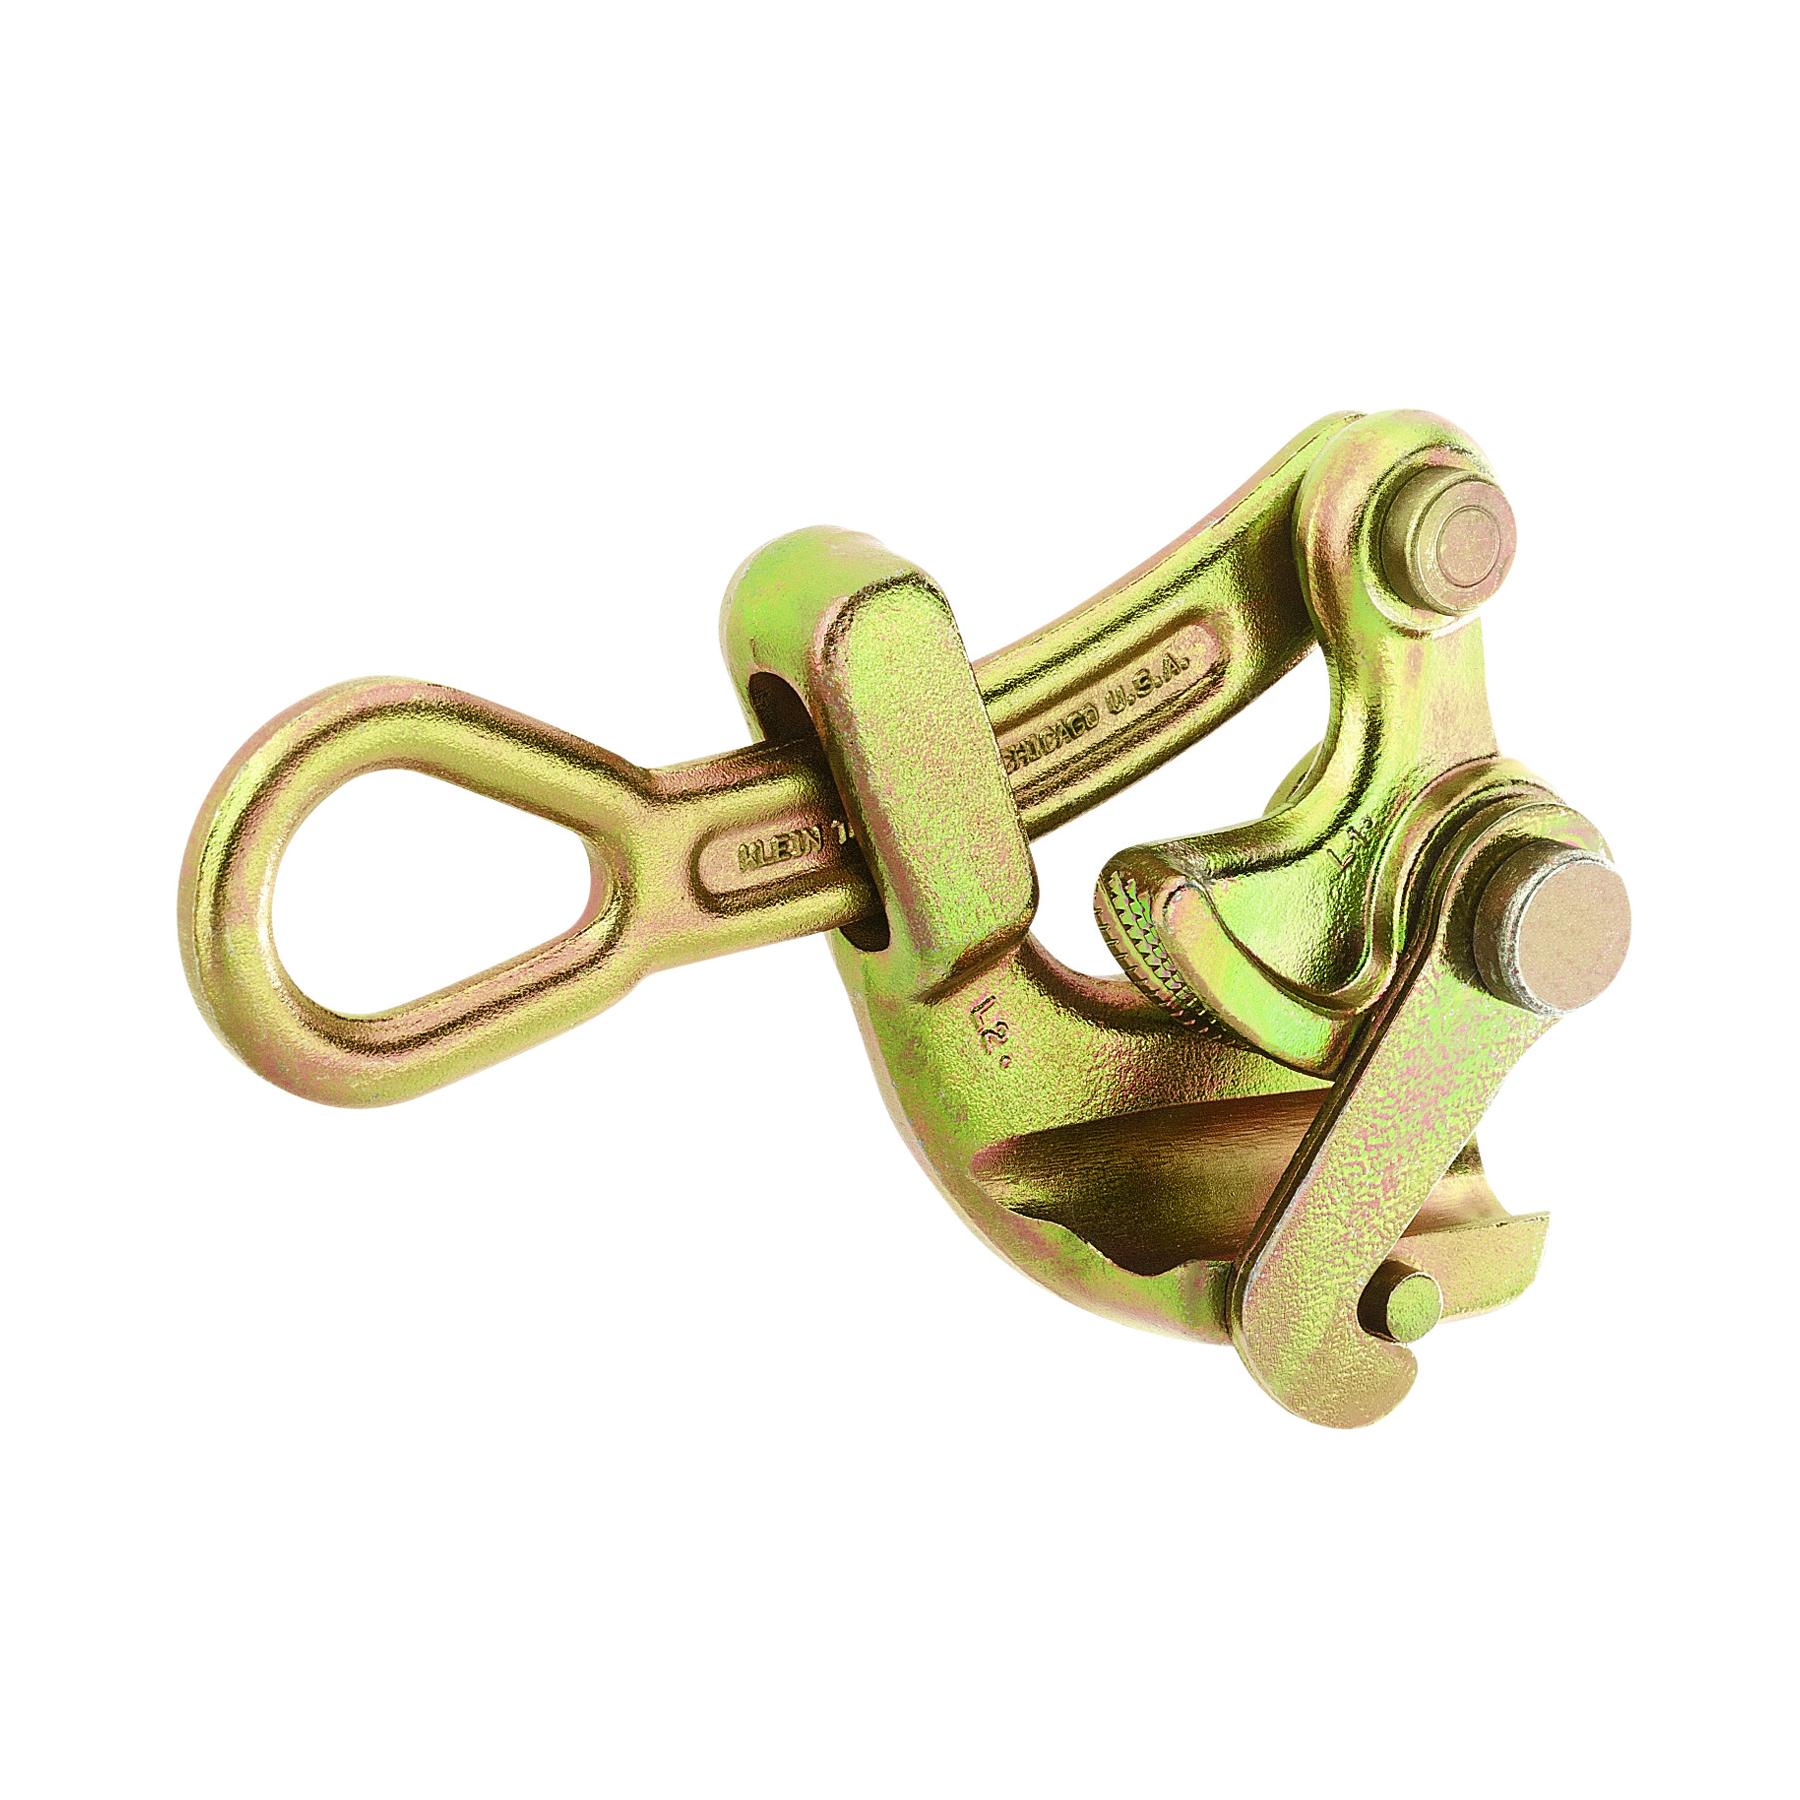 Klein Havens® Grip for Wire Rope 0.75\'\' - 1625-20 | Klein Tools ...